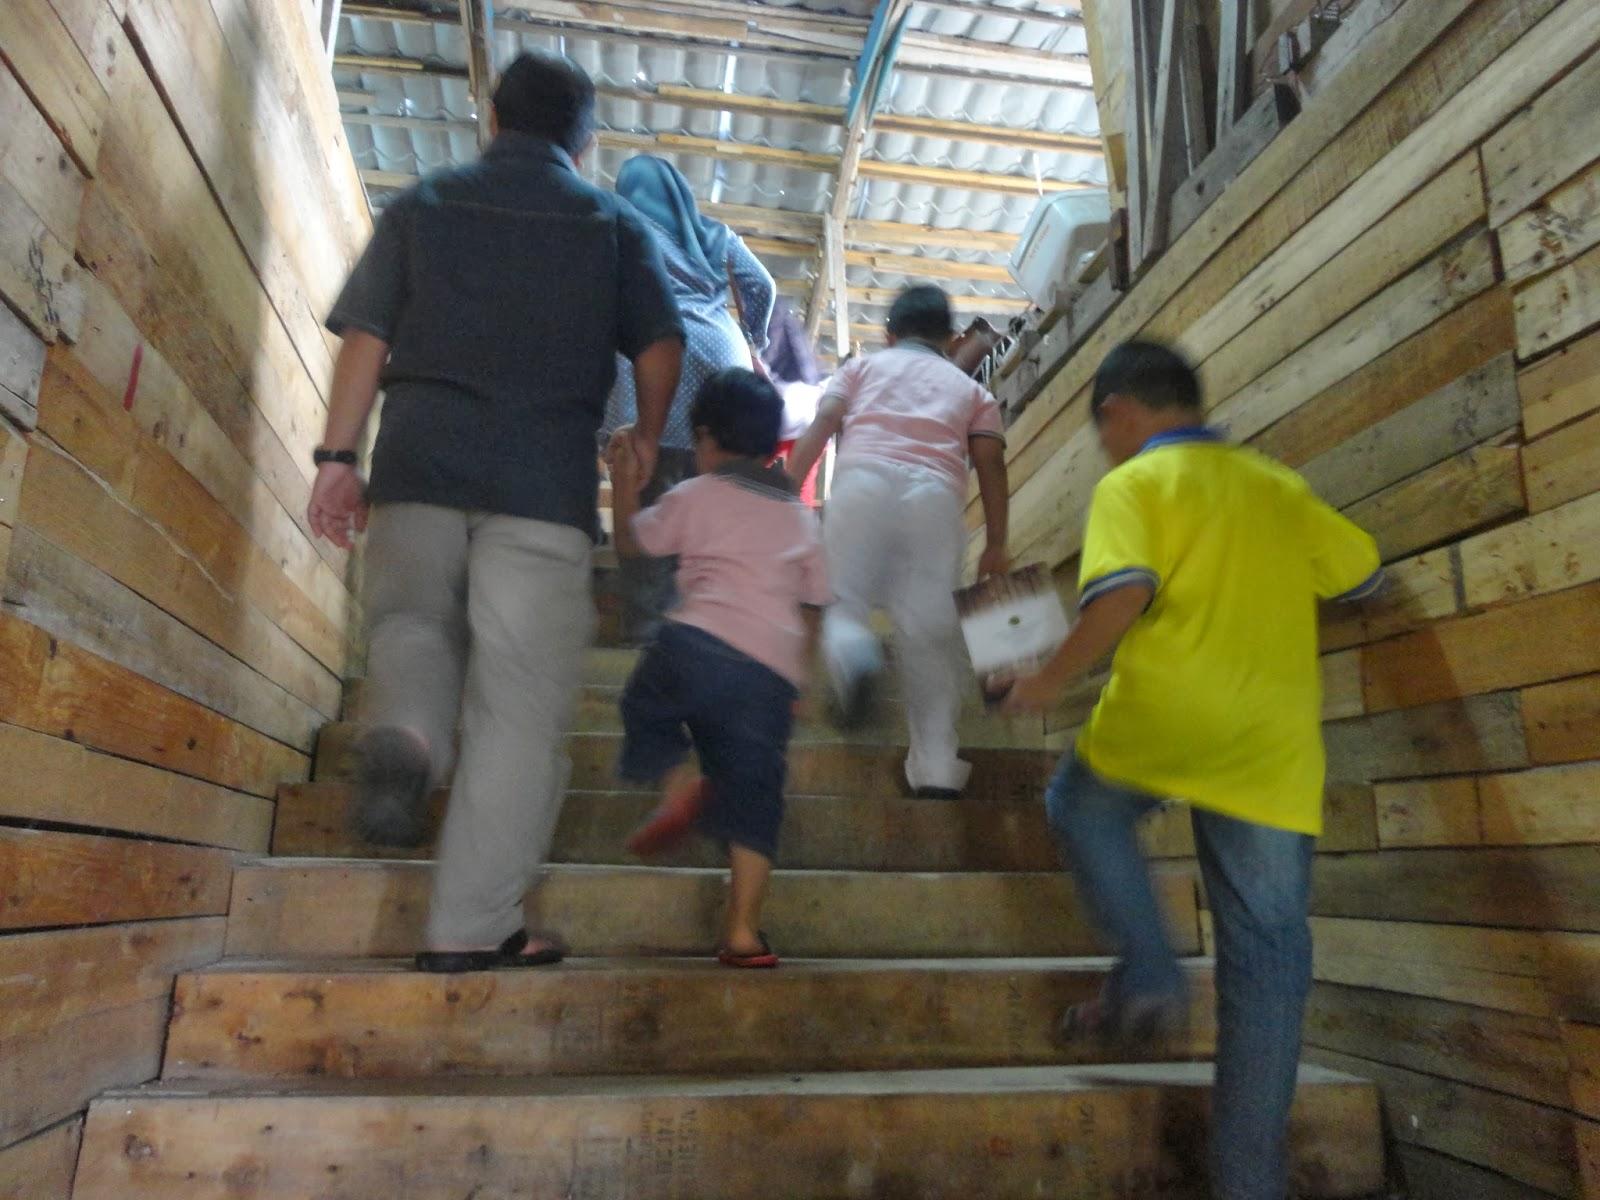 tangga naik ke tingkat 3 menempatkan dorm lelaki